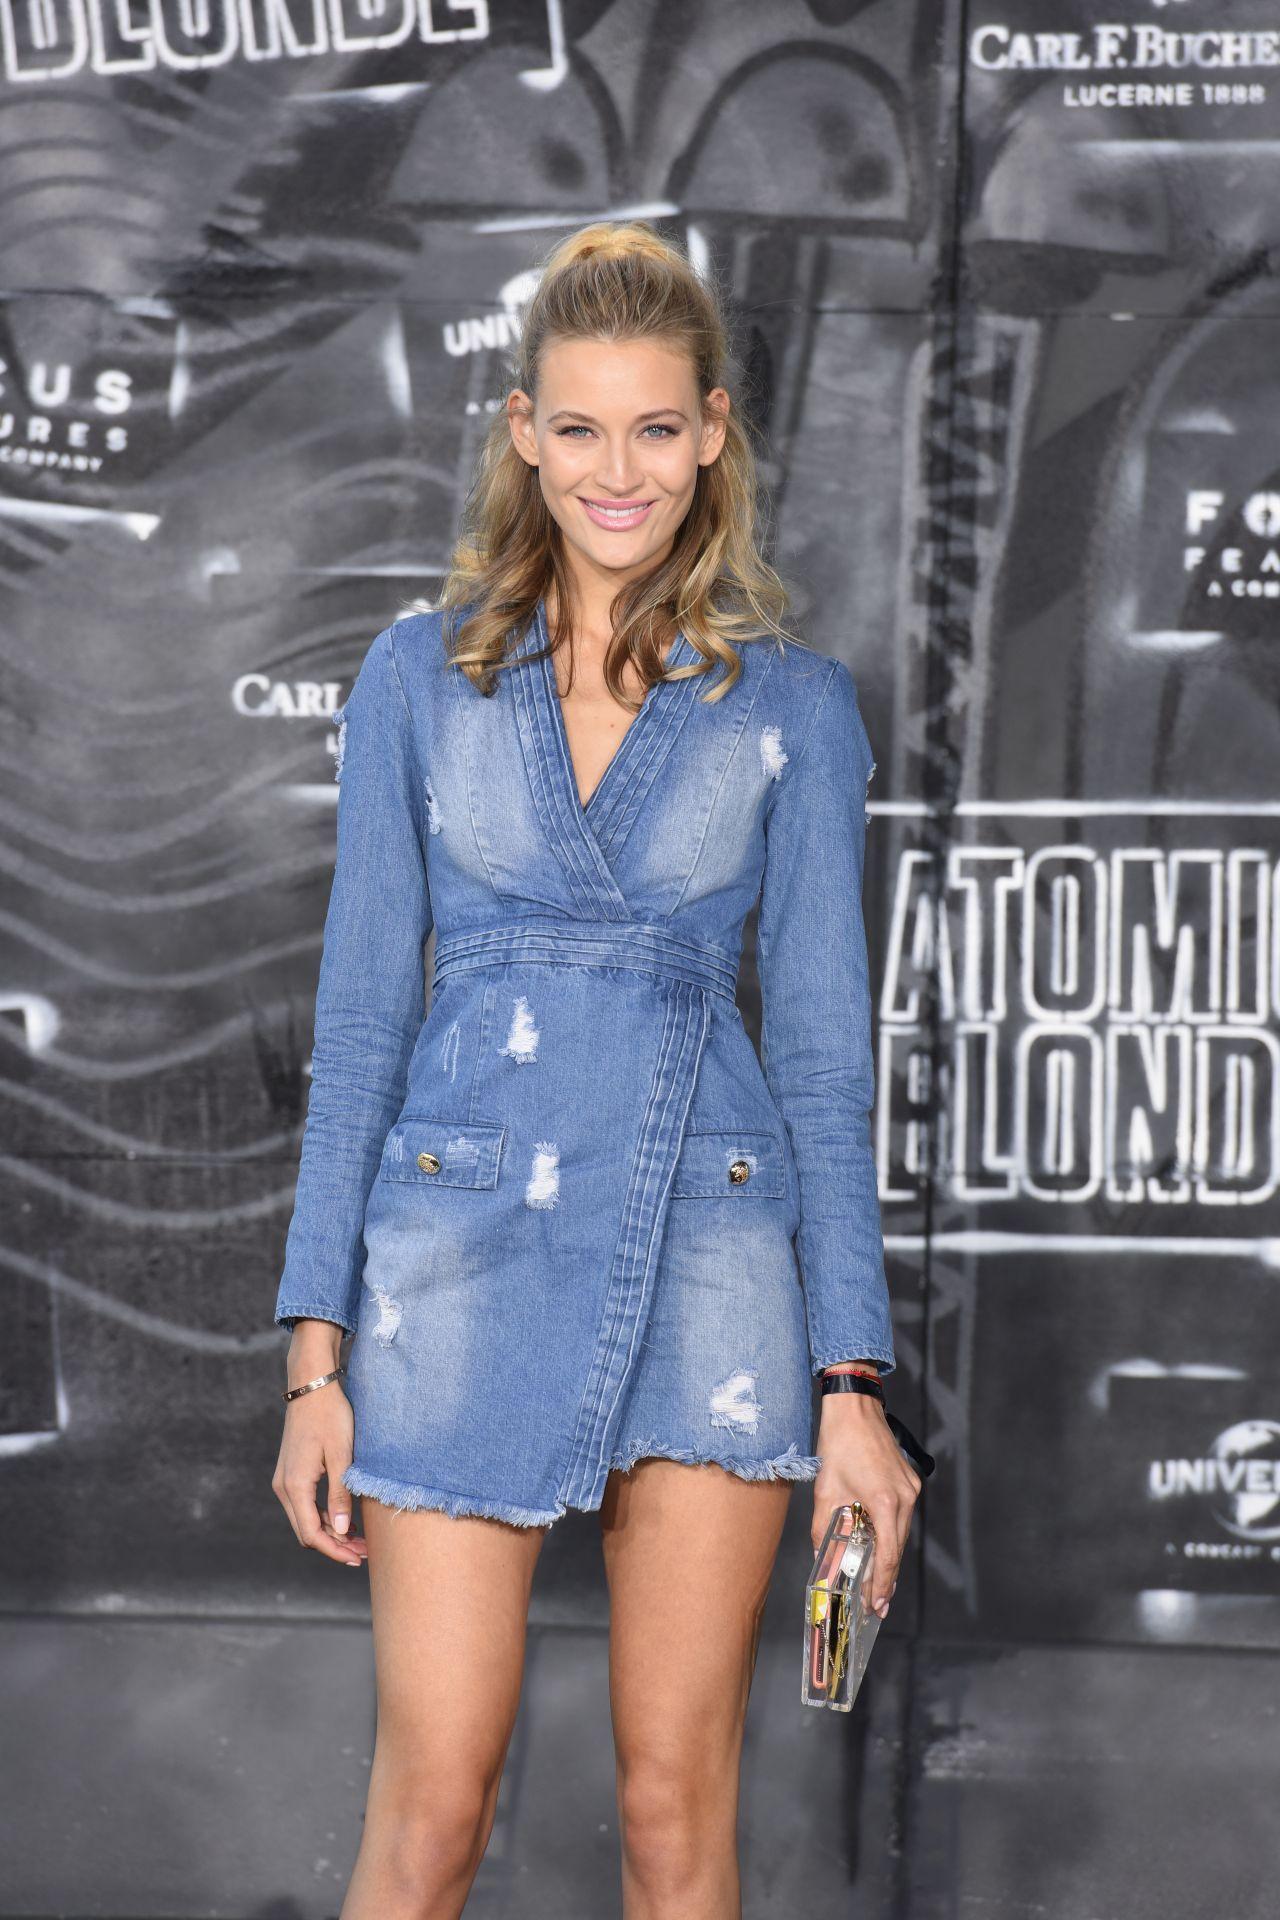 Mandy Bork - Atomic Blonde Premiere in Berlin 07/17/2017